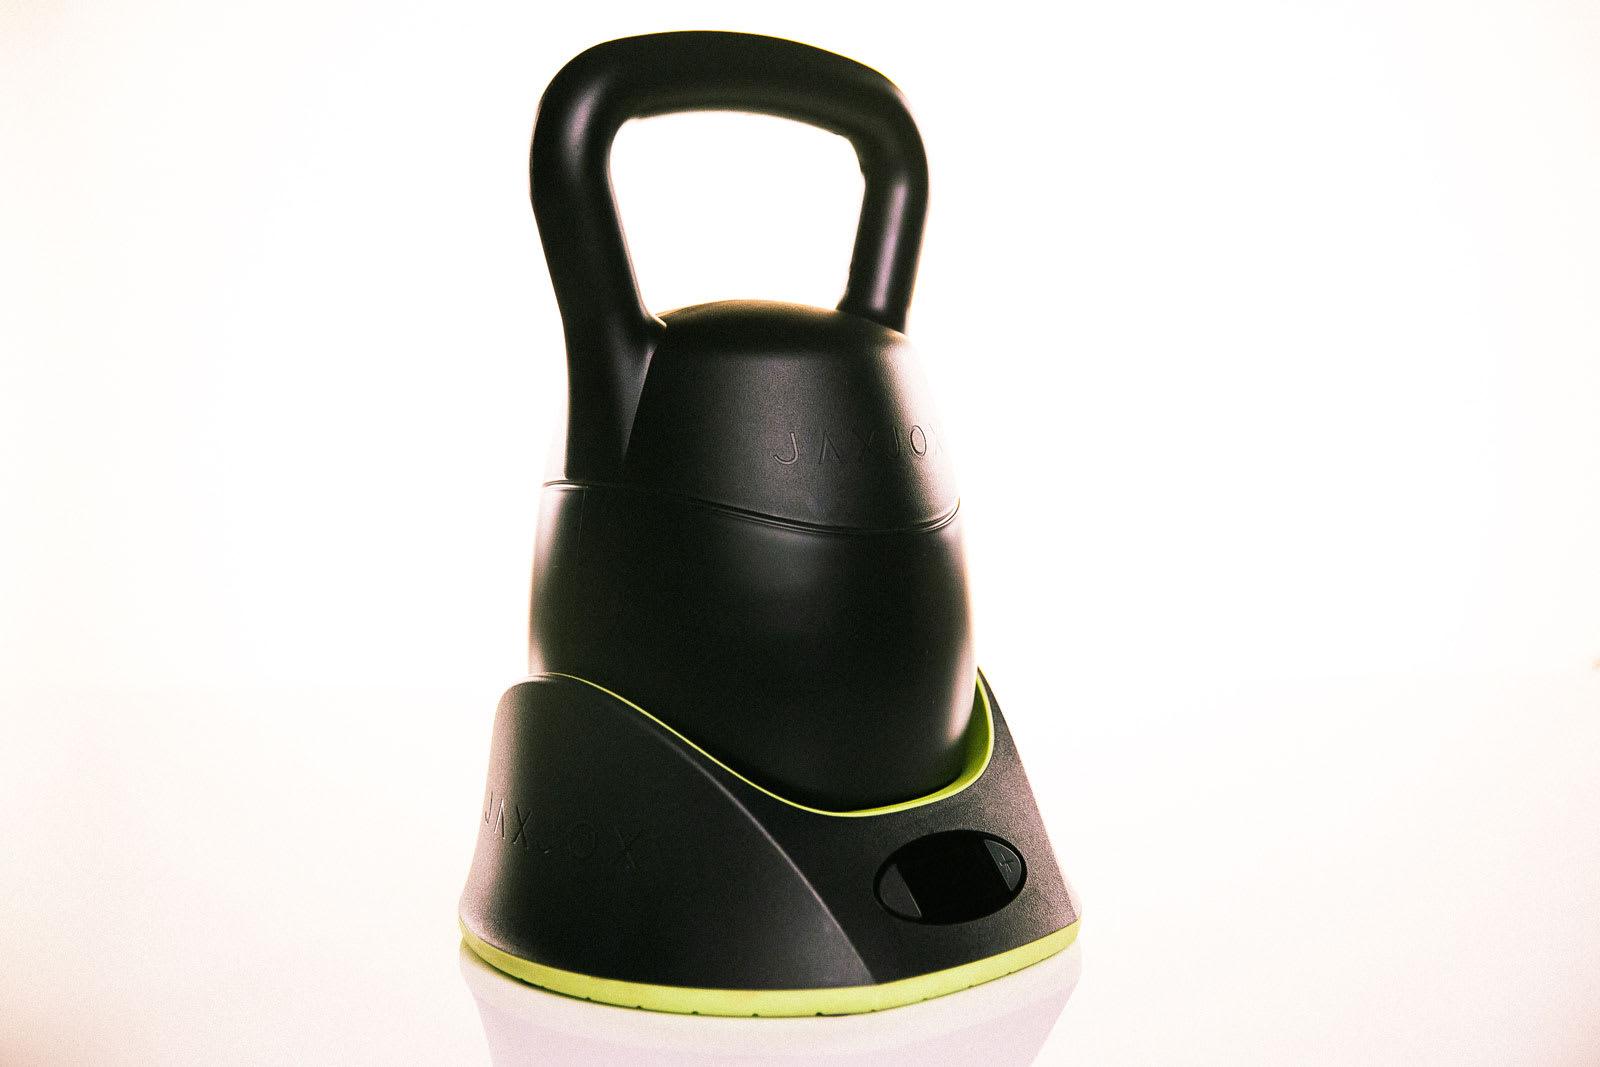 JAXJOX smart kettlebell